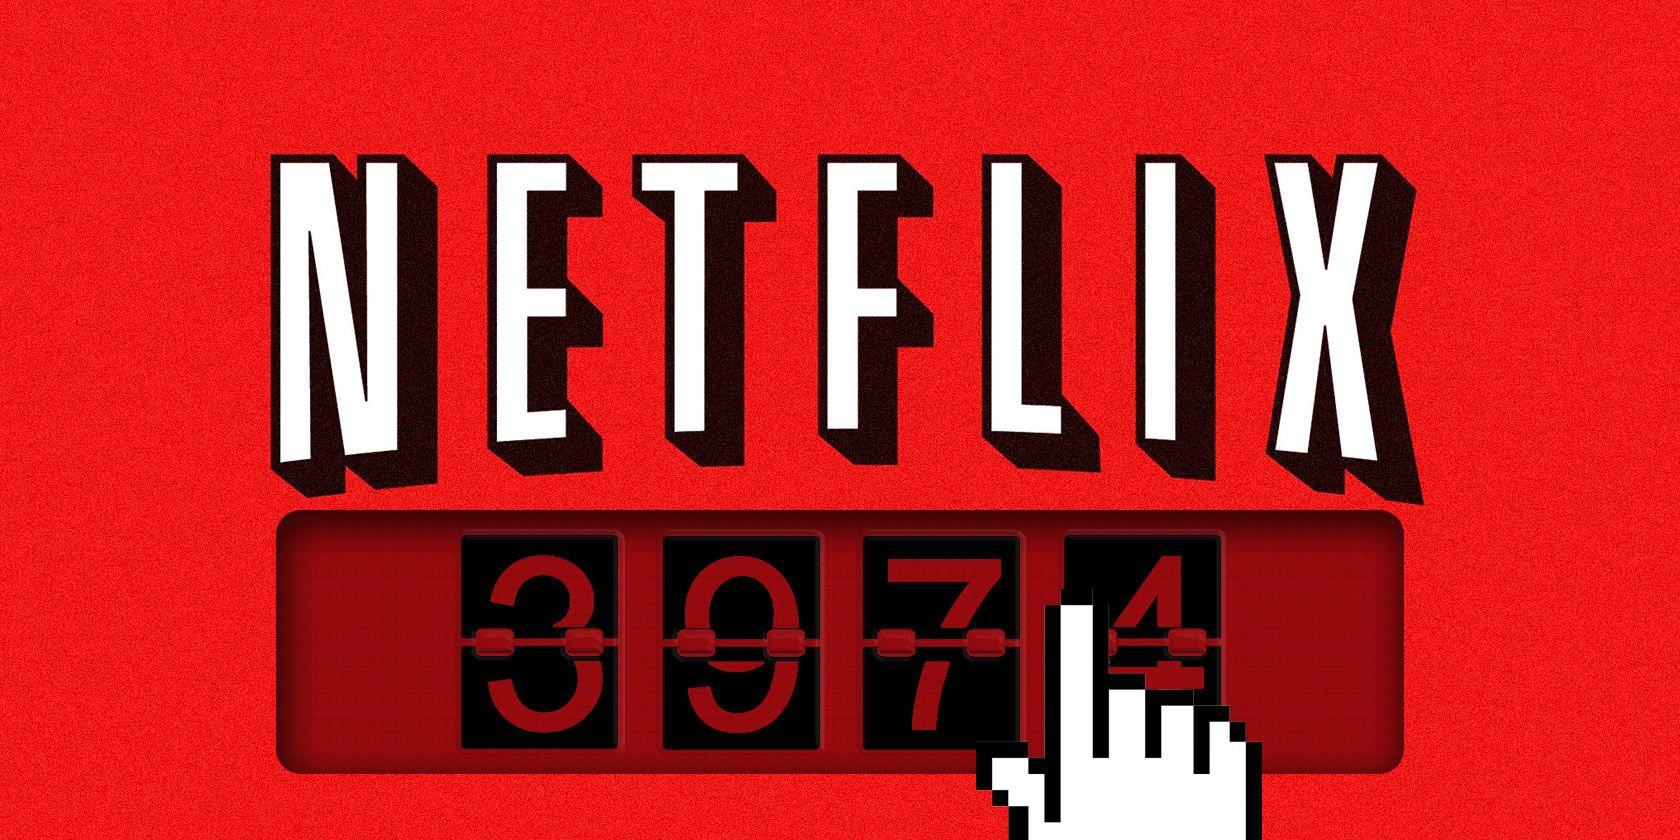 20 Secret Netflix Codes to Help You Find New Content